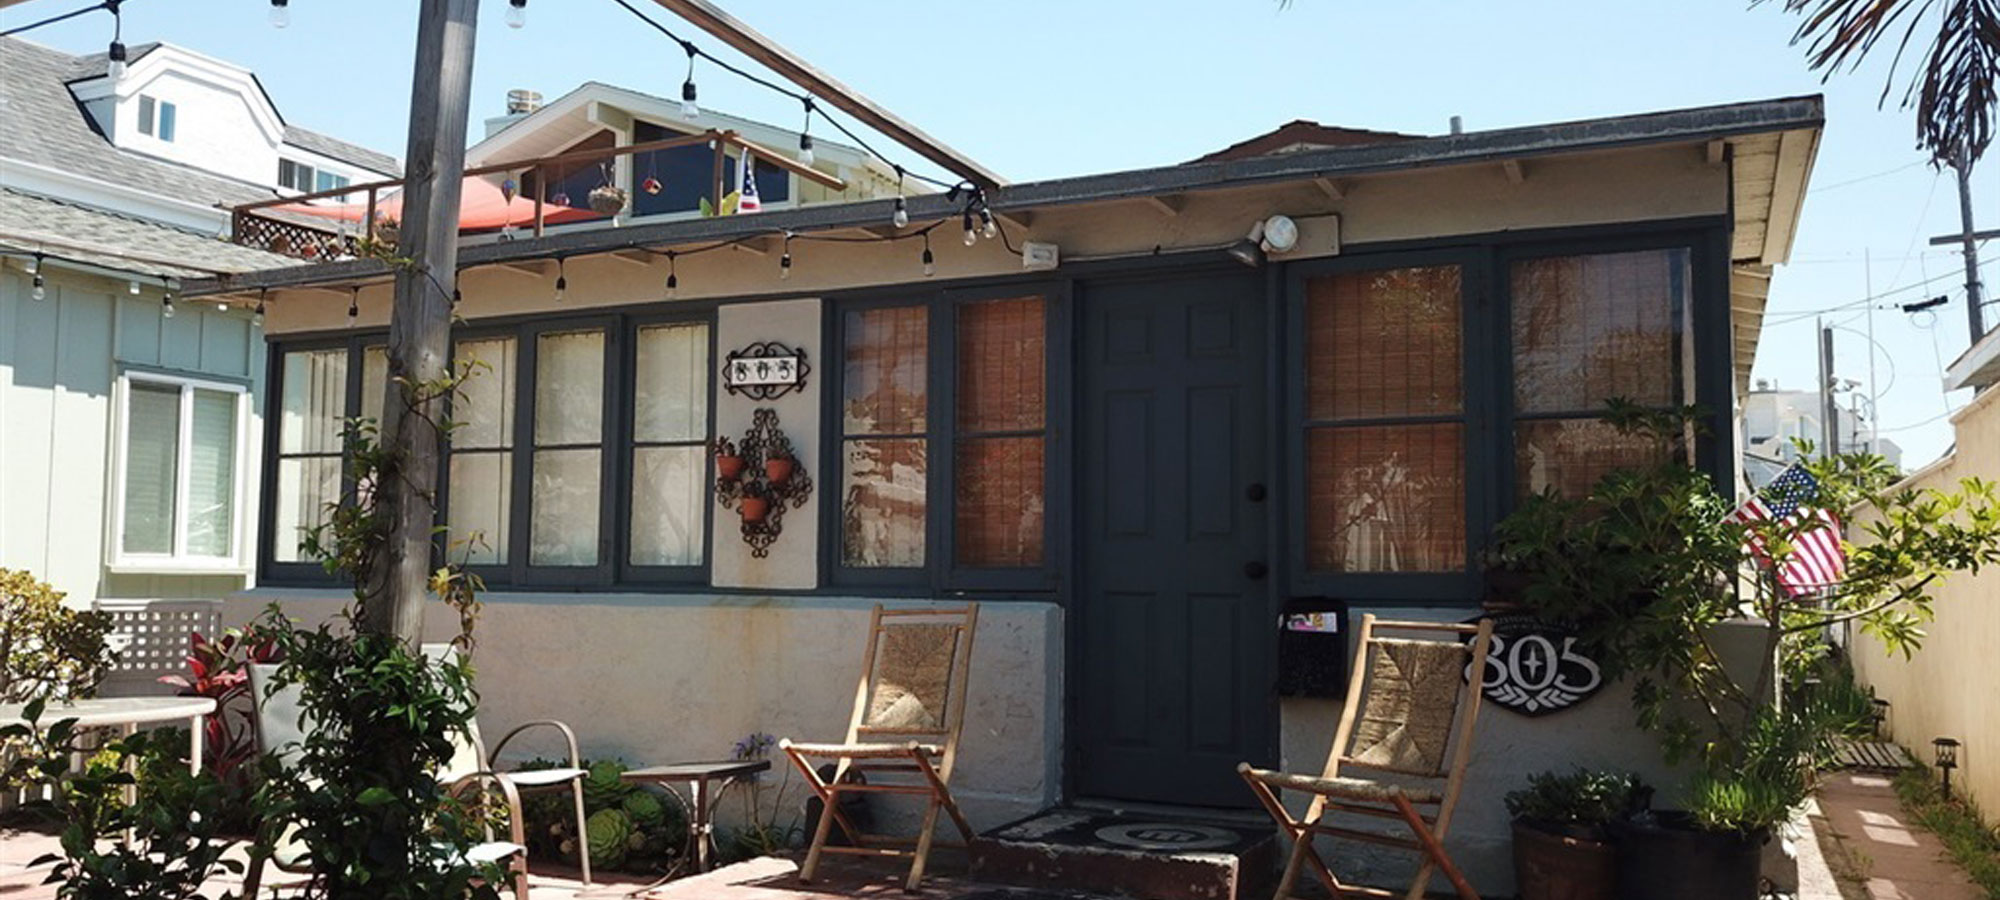 805 Ormond Ct, San Diego, CA 92109